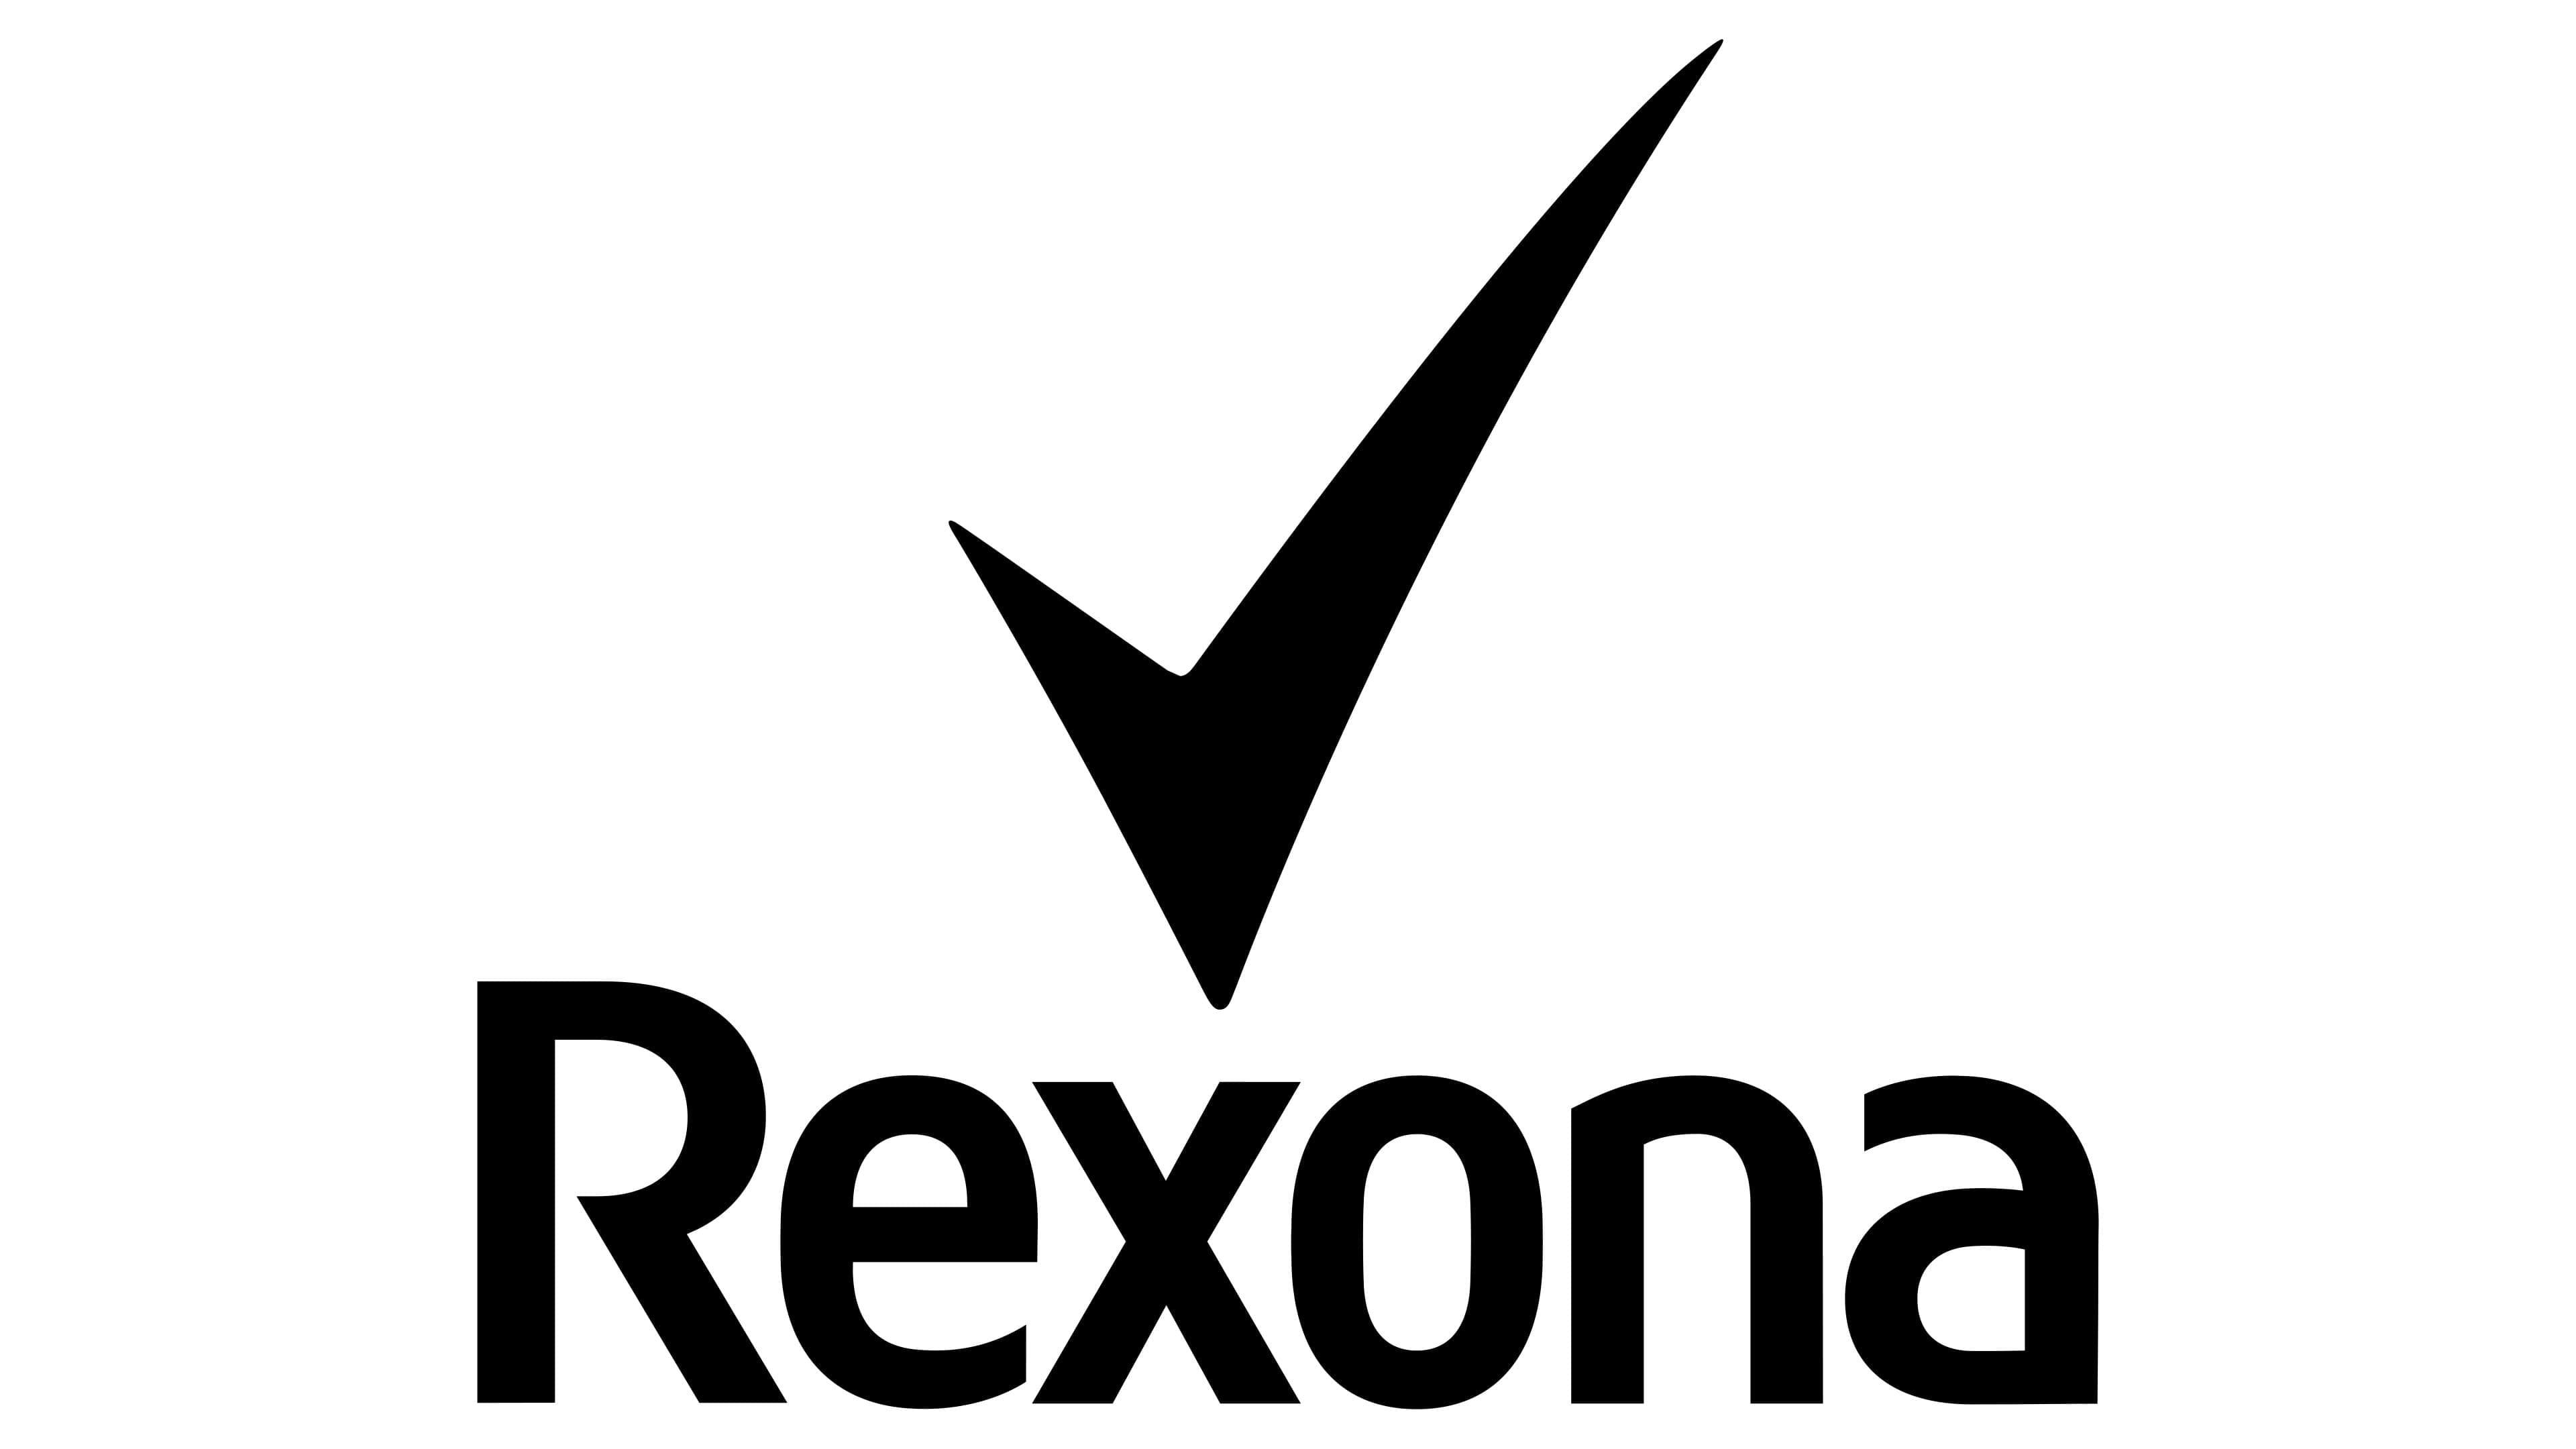 ركسونا - REXONA